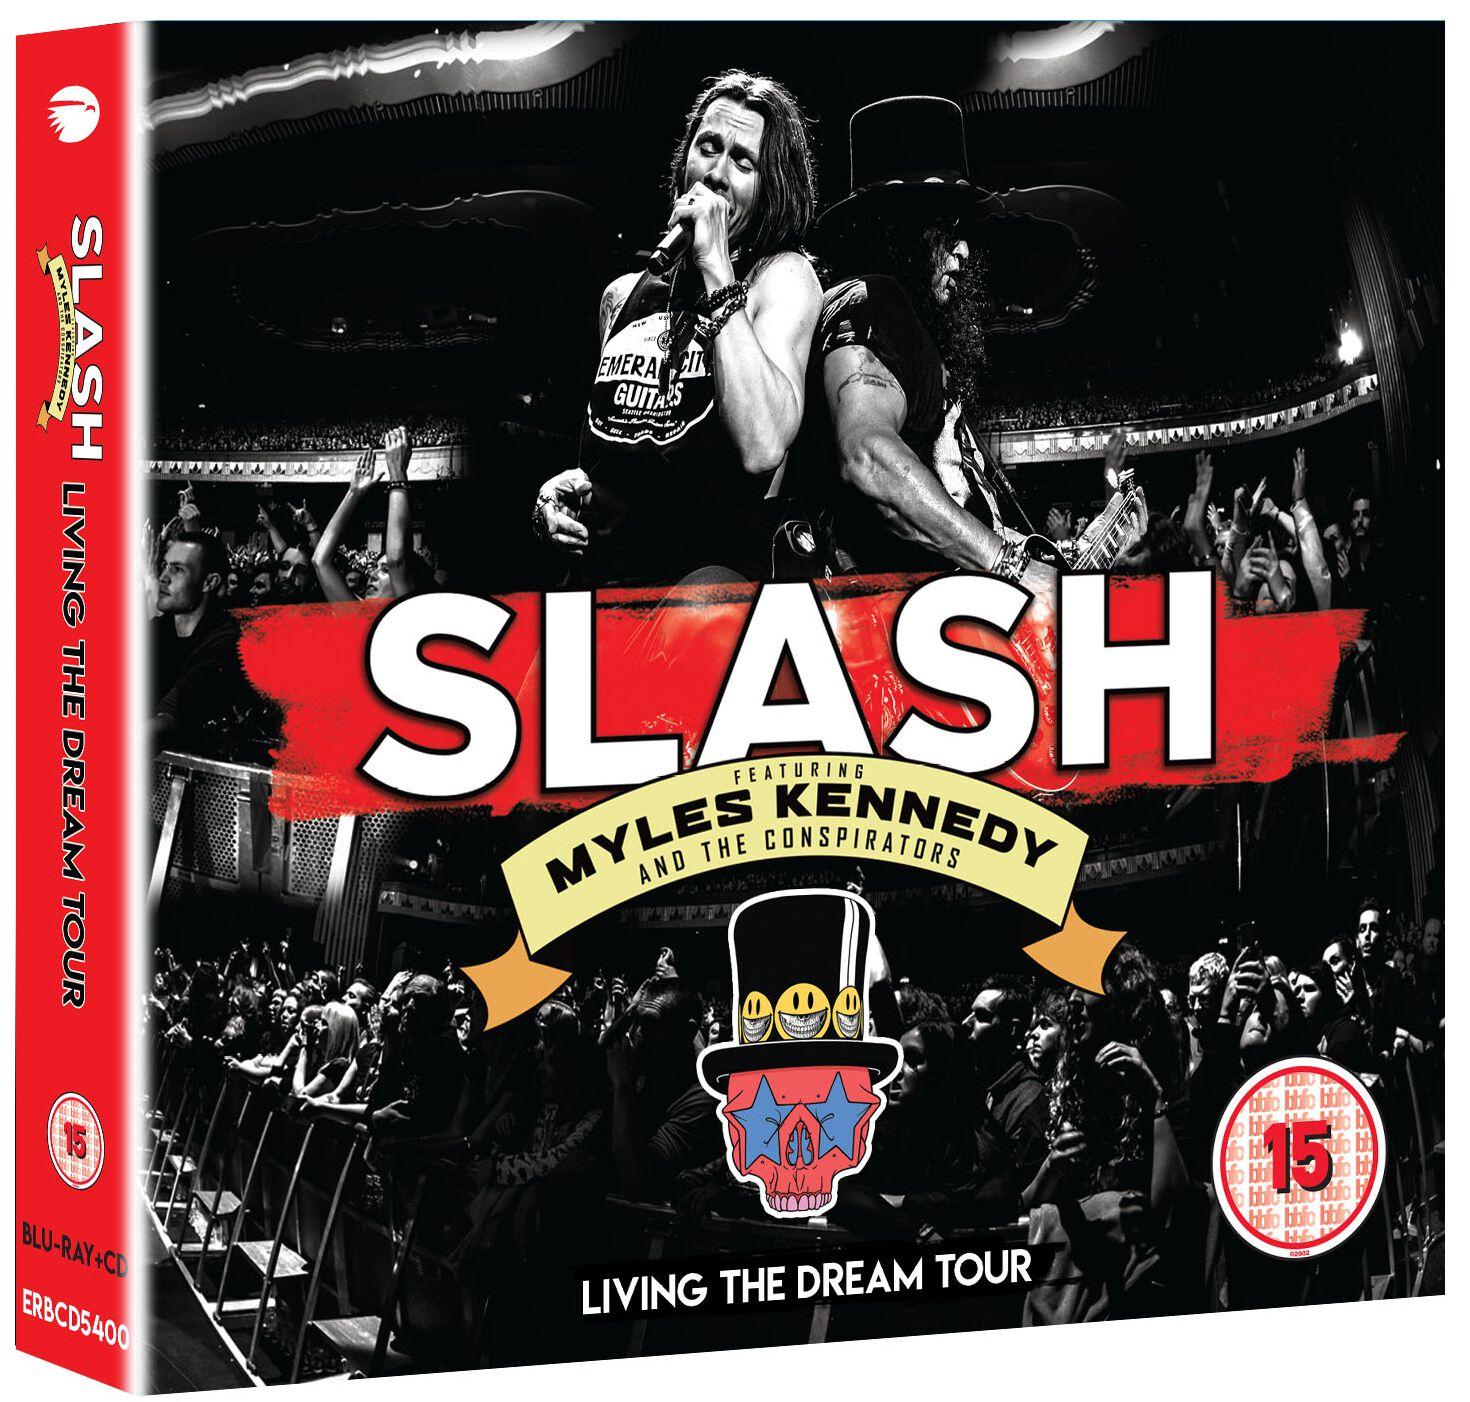 Image of Slash Living The Dream Tour 2-CD & Blu-ray Standard